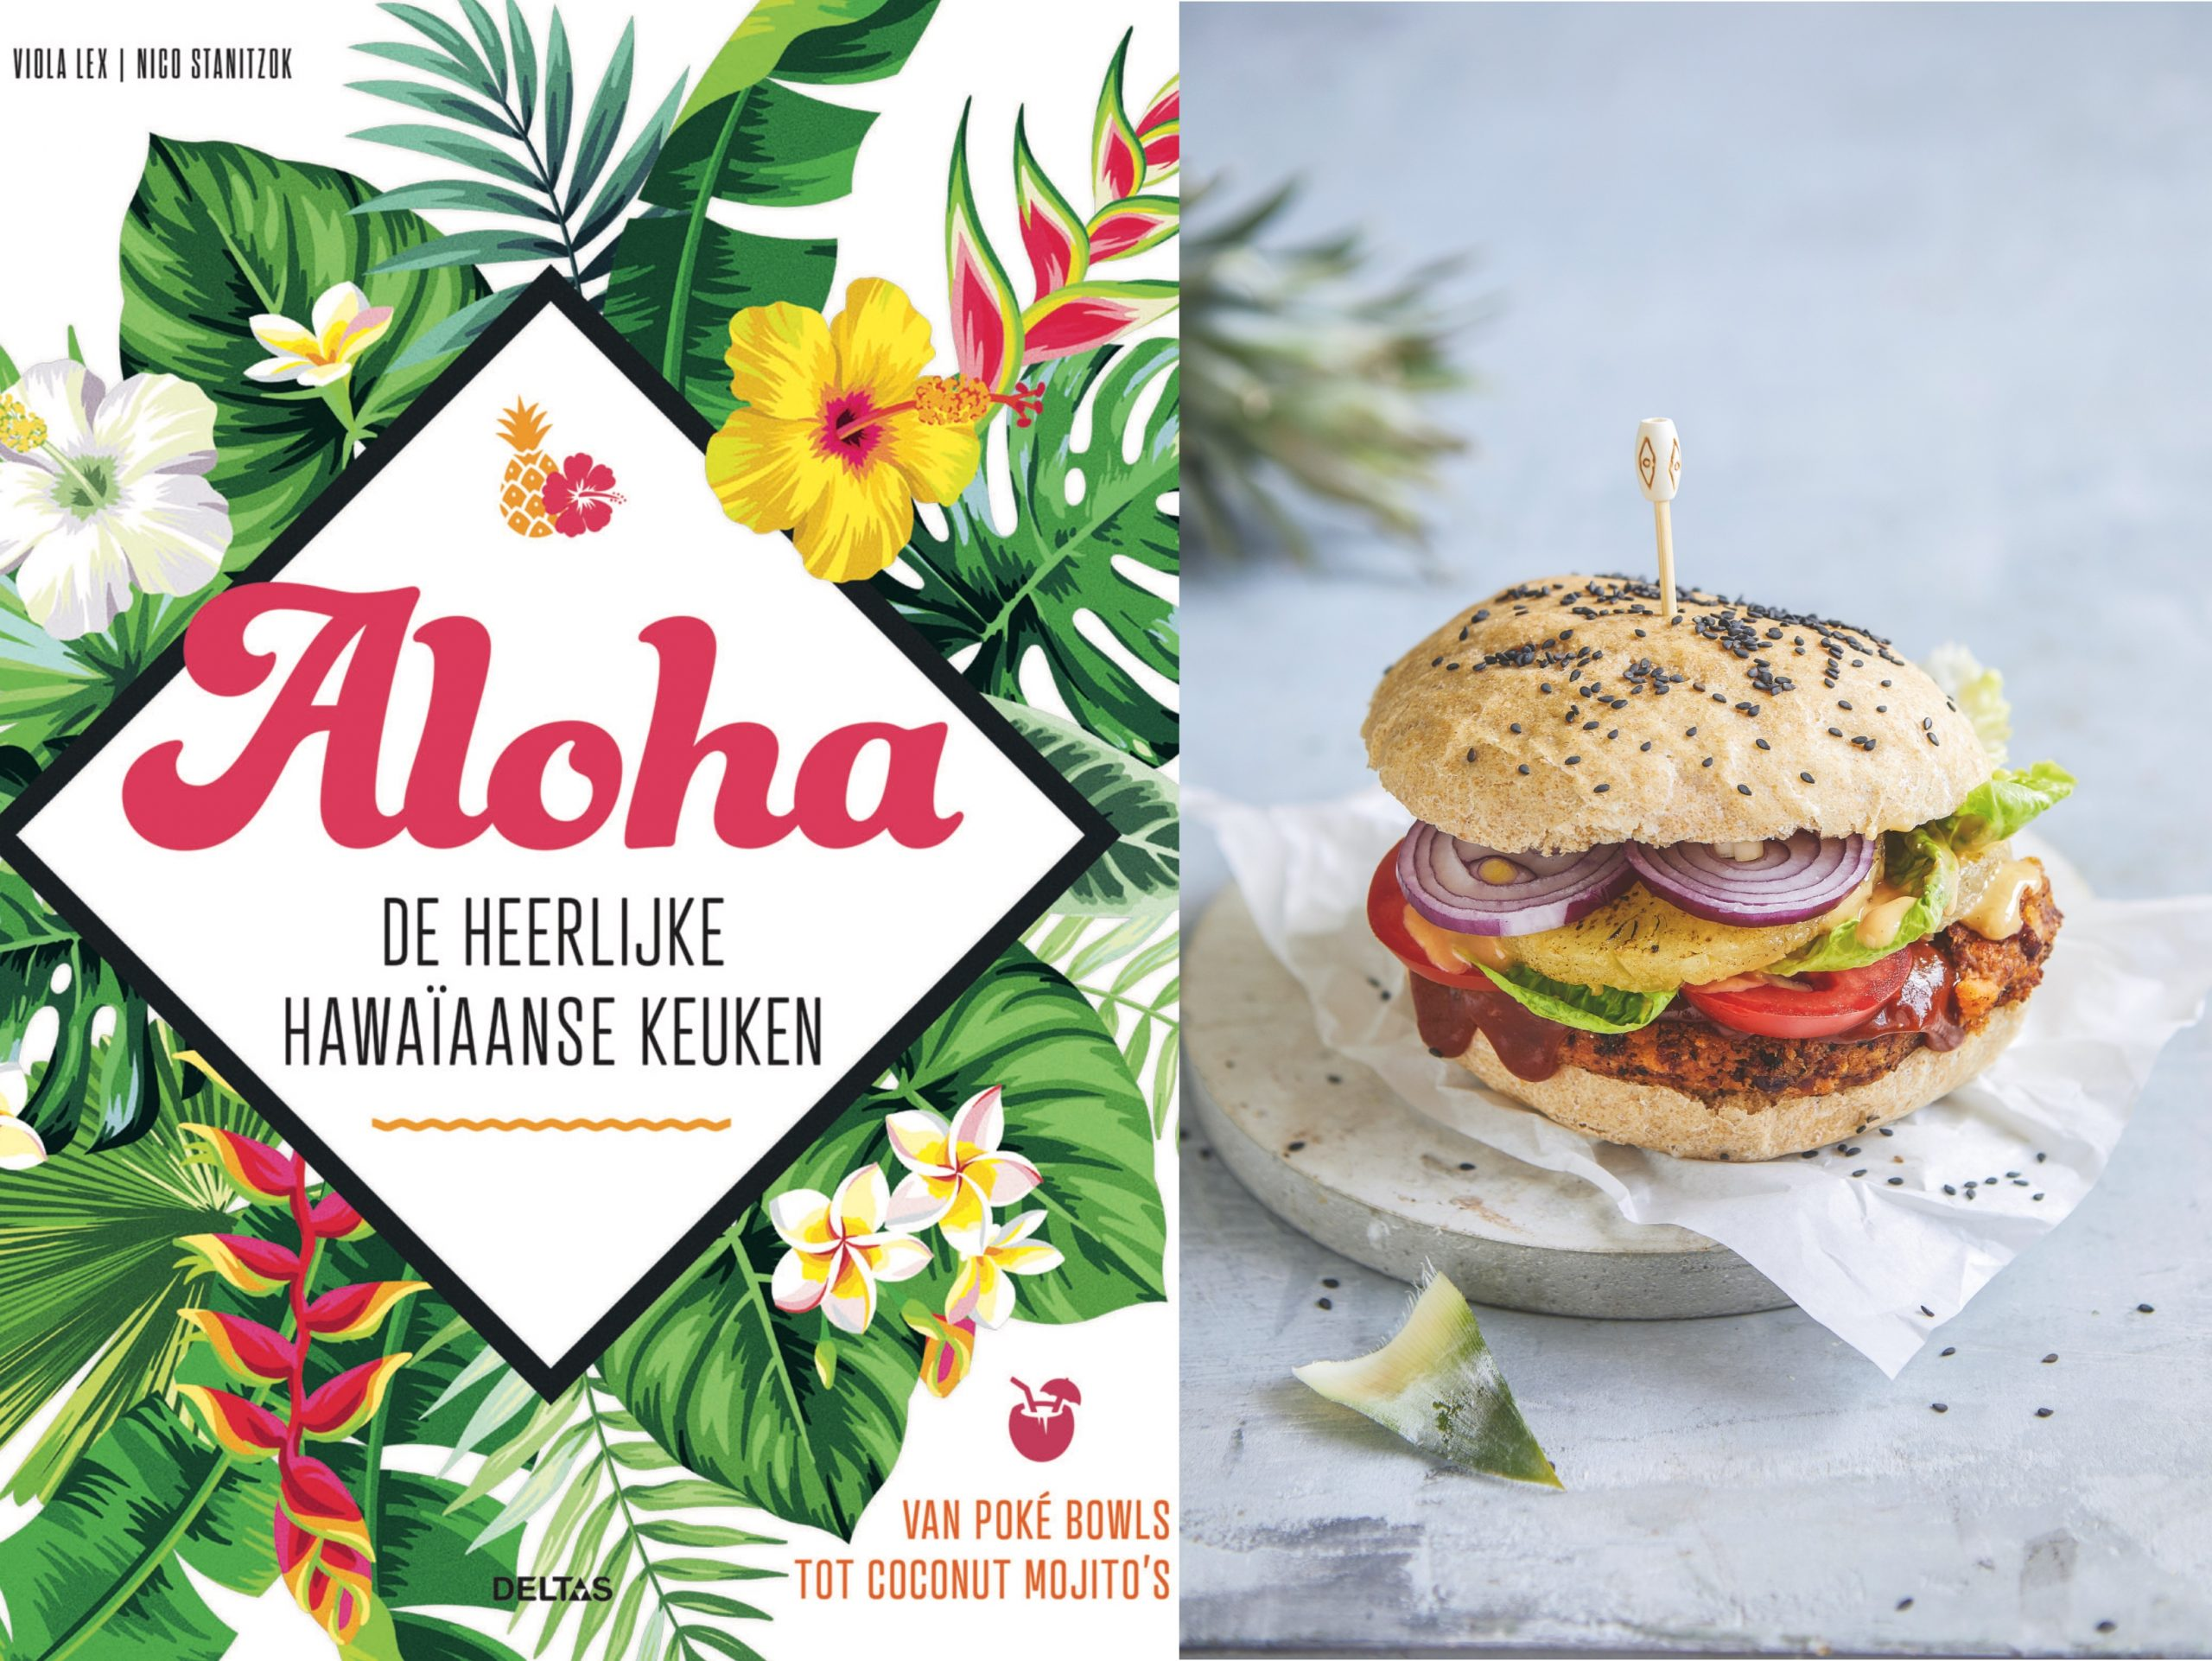 Wereldkeuken: de Hawaïaanse keuken